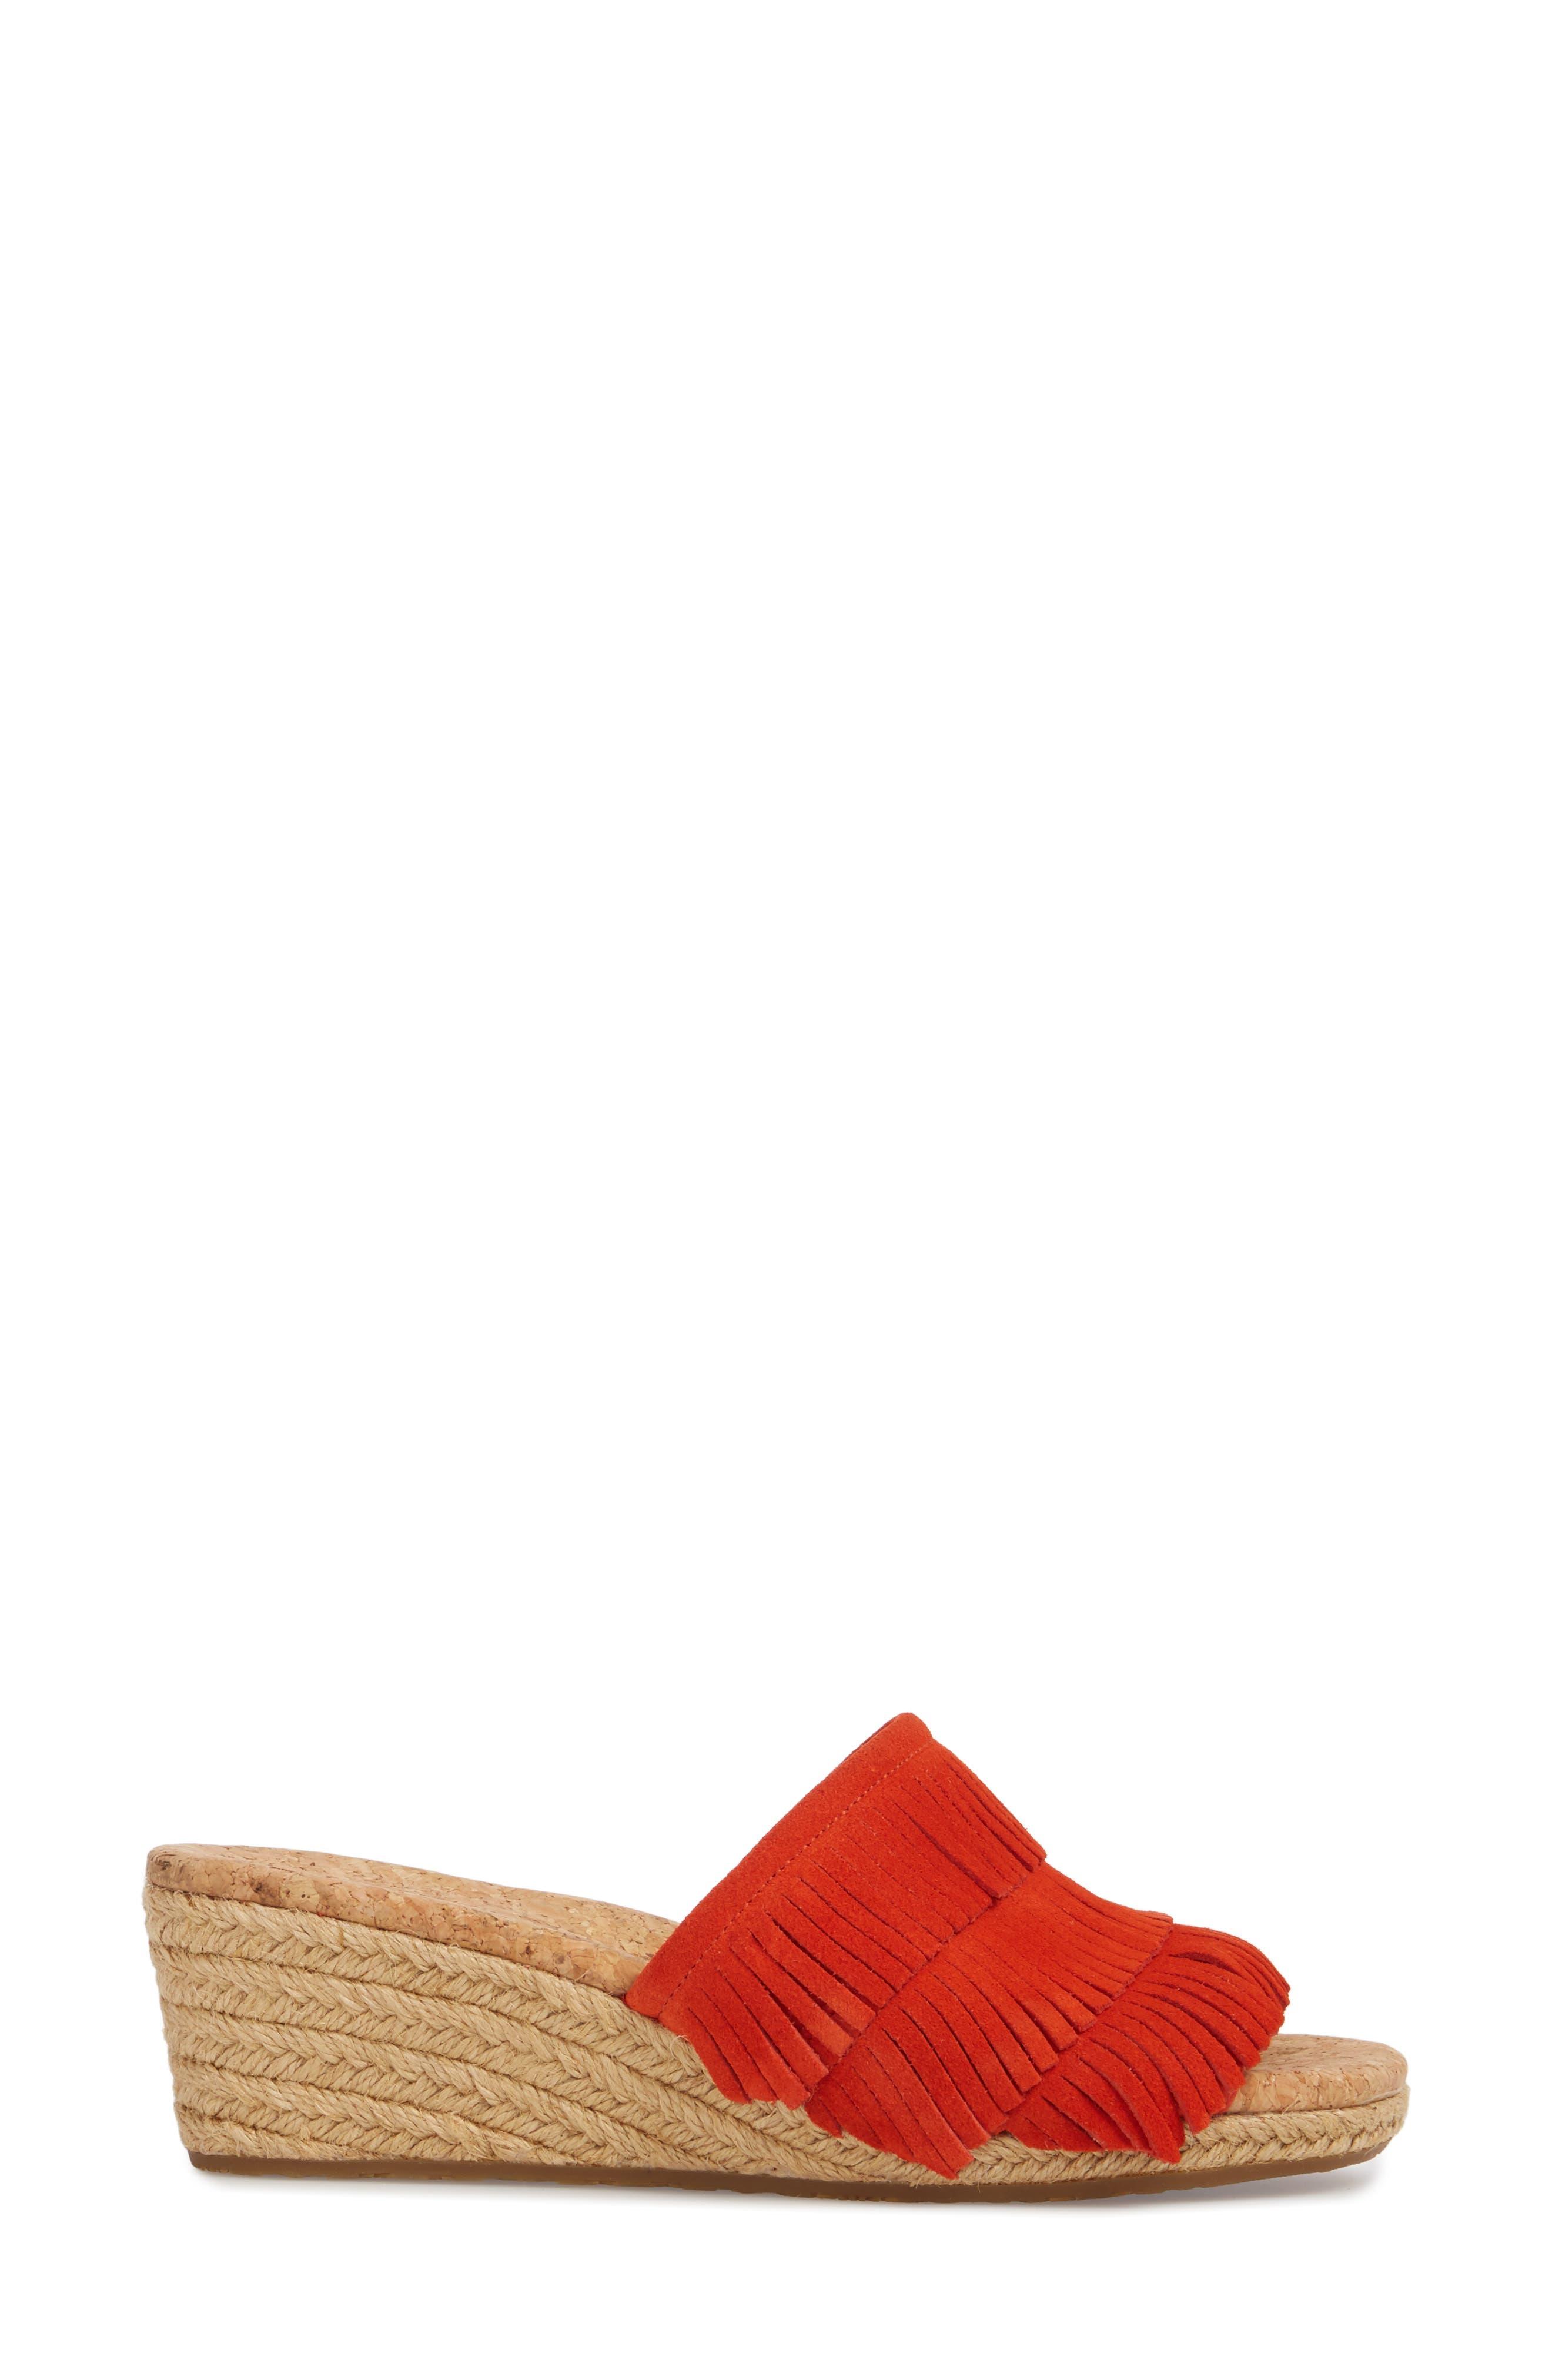 Kendra Fringe Wedge Sandal,                             Alternate thumbnail 3, color,                             Red Orange